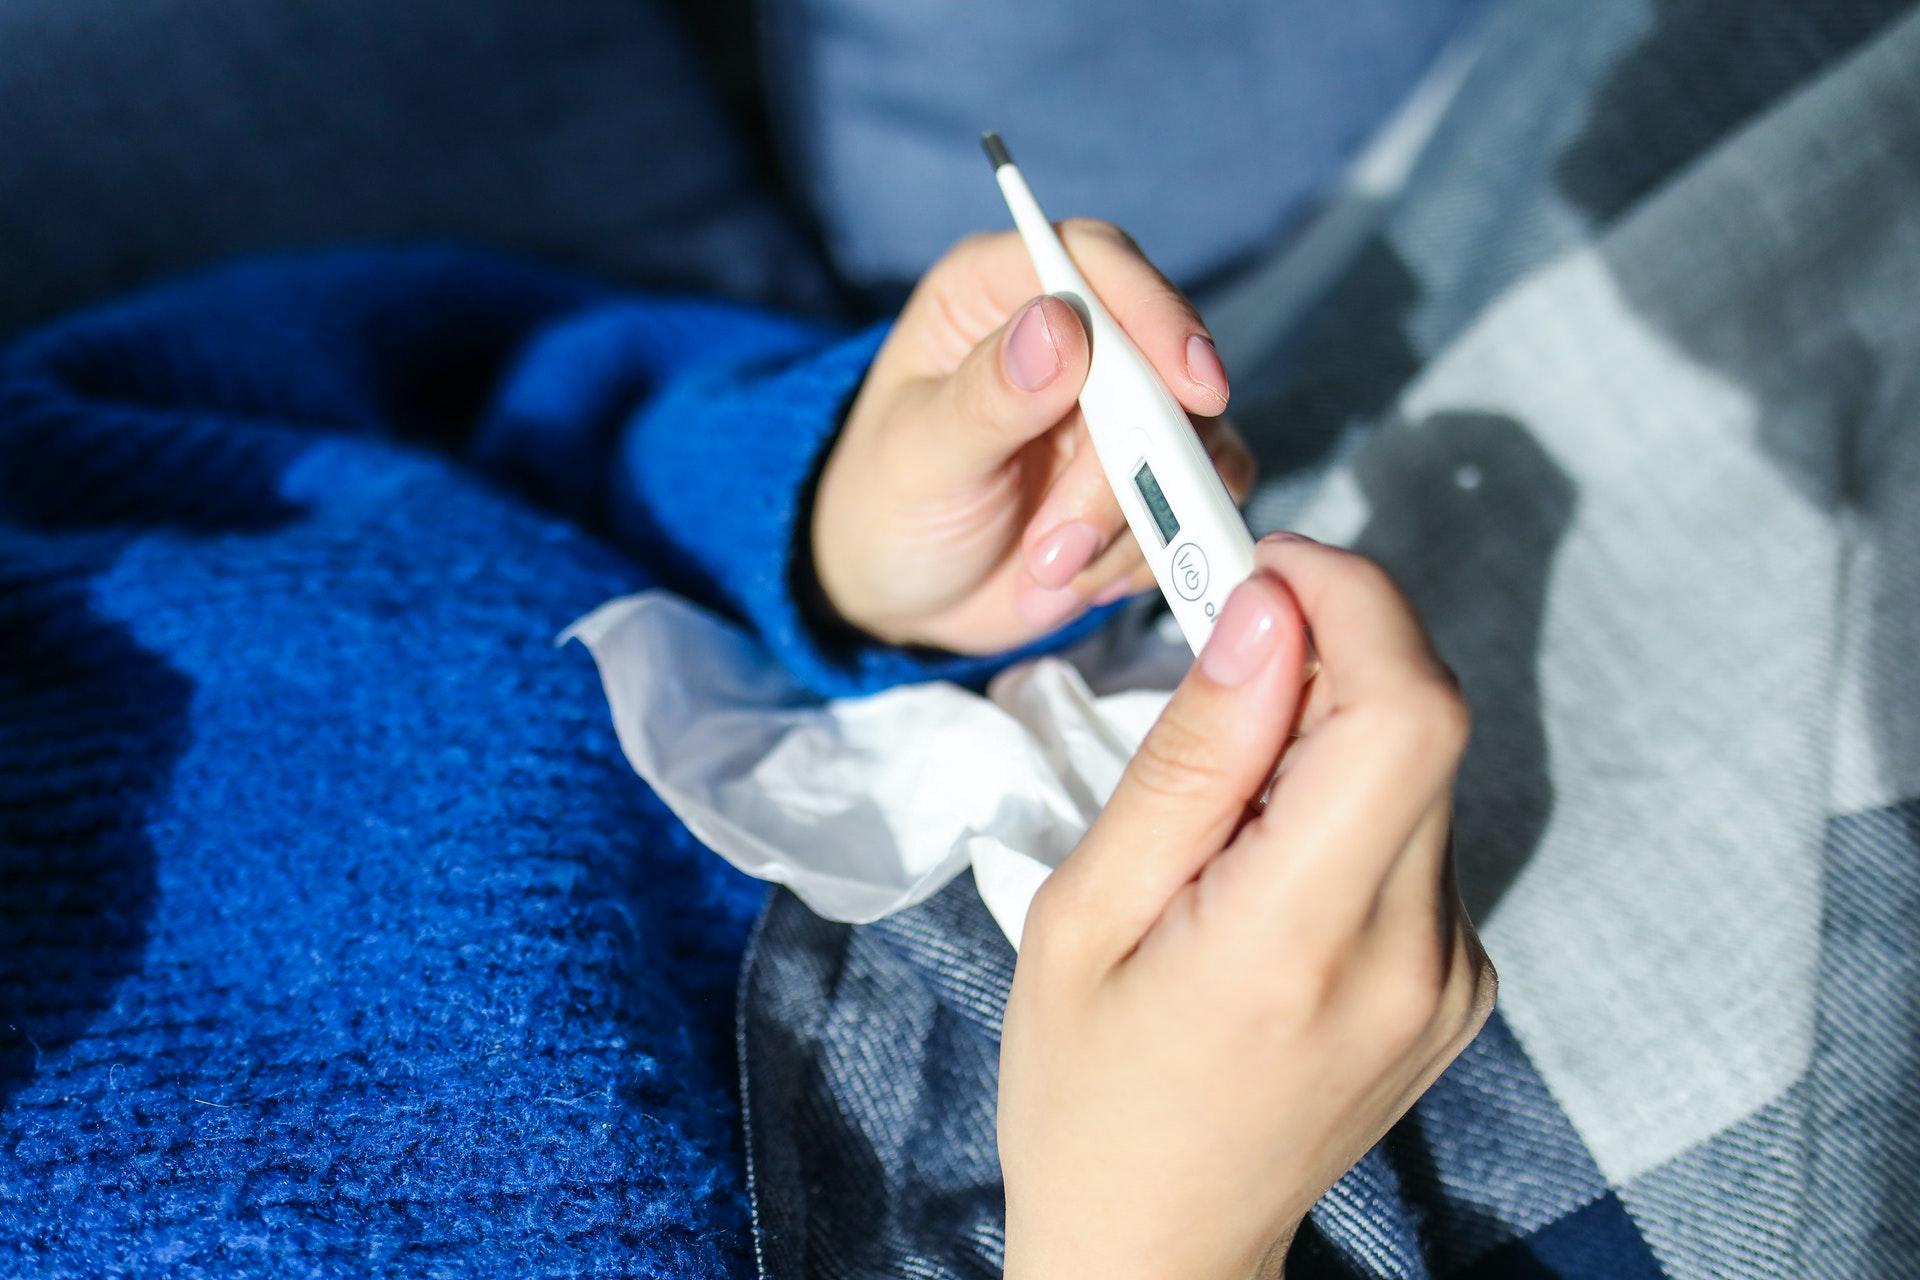 Pessoa conferindo temperatura com termômetro. Crédito: Pexels